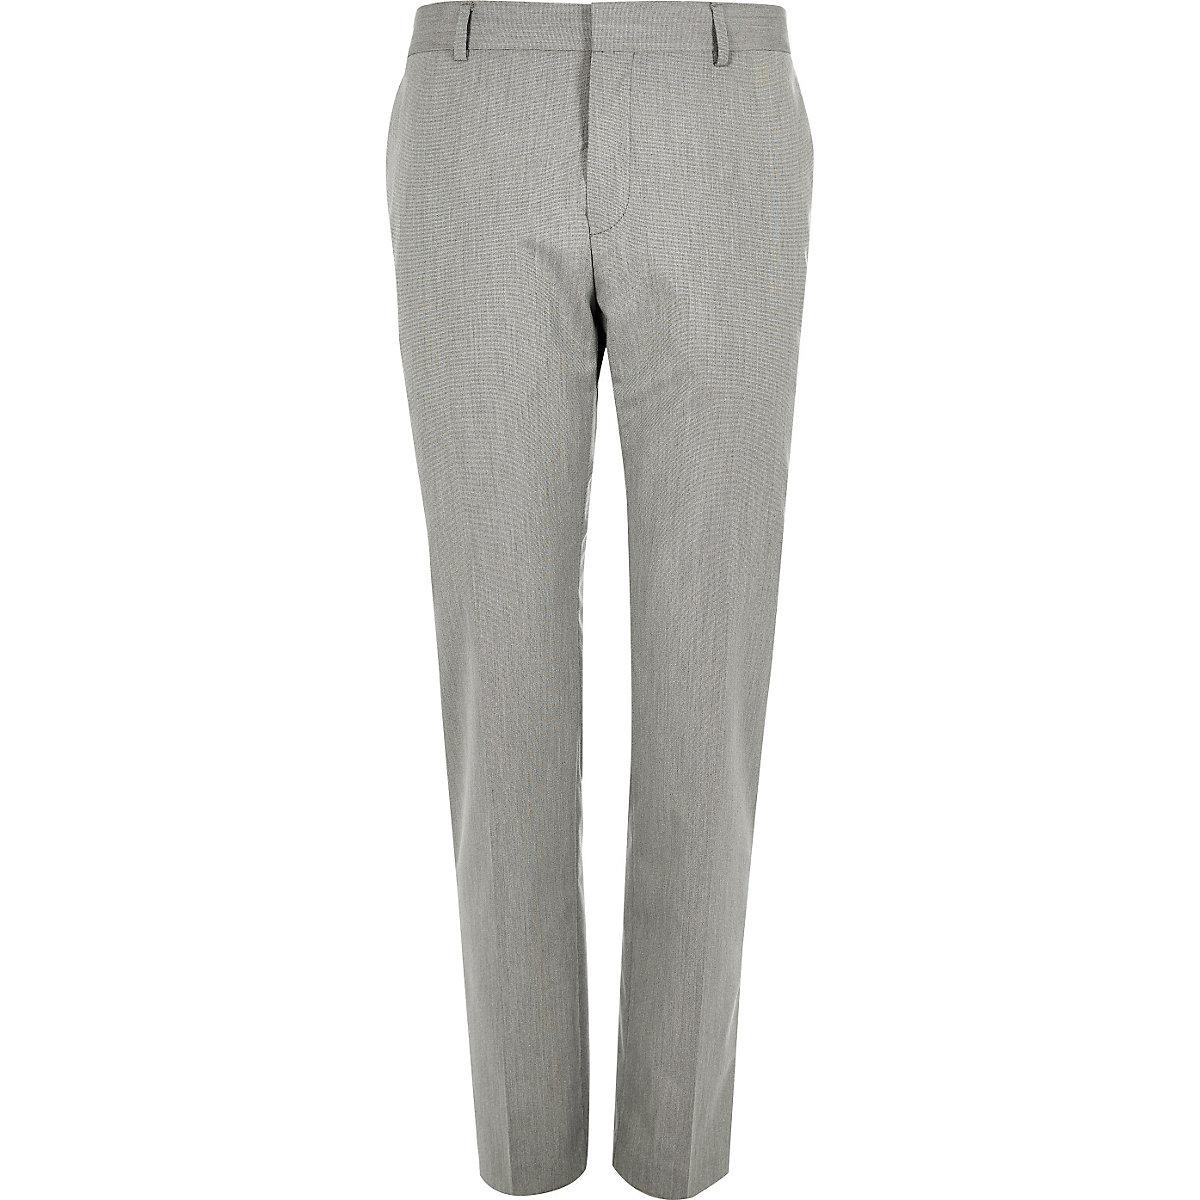 Grey slim suit trousers